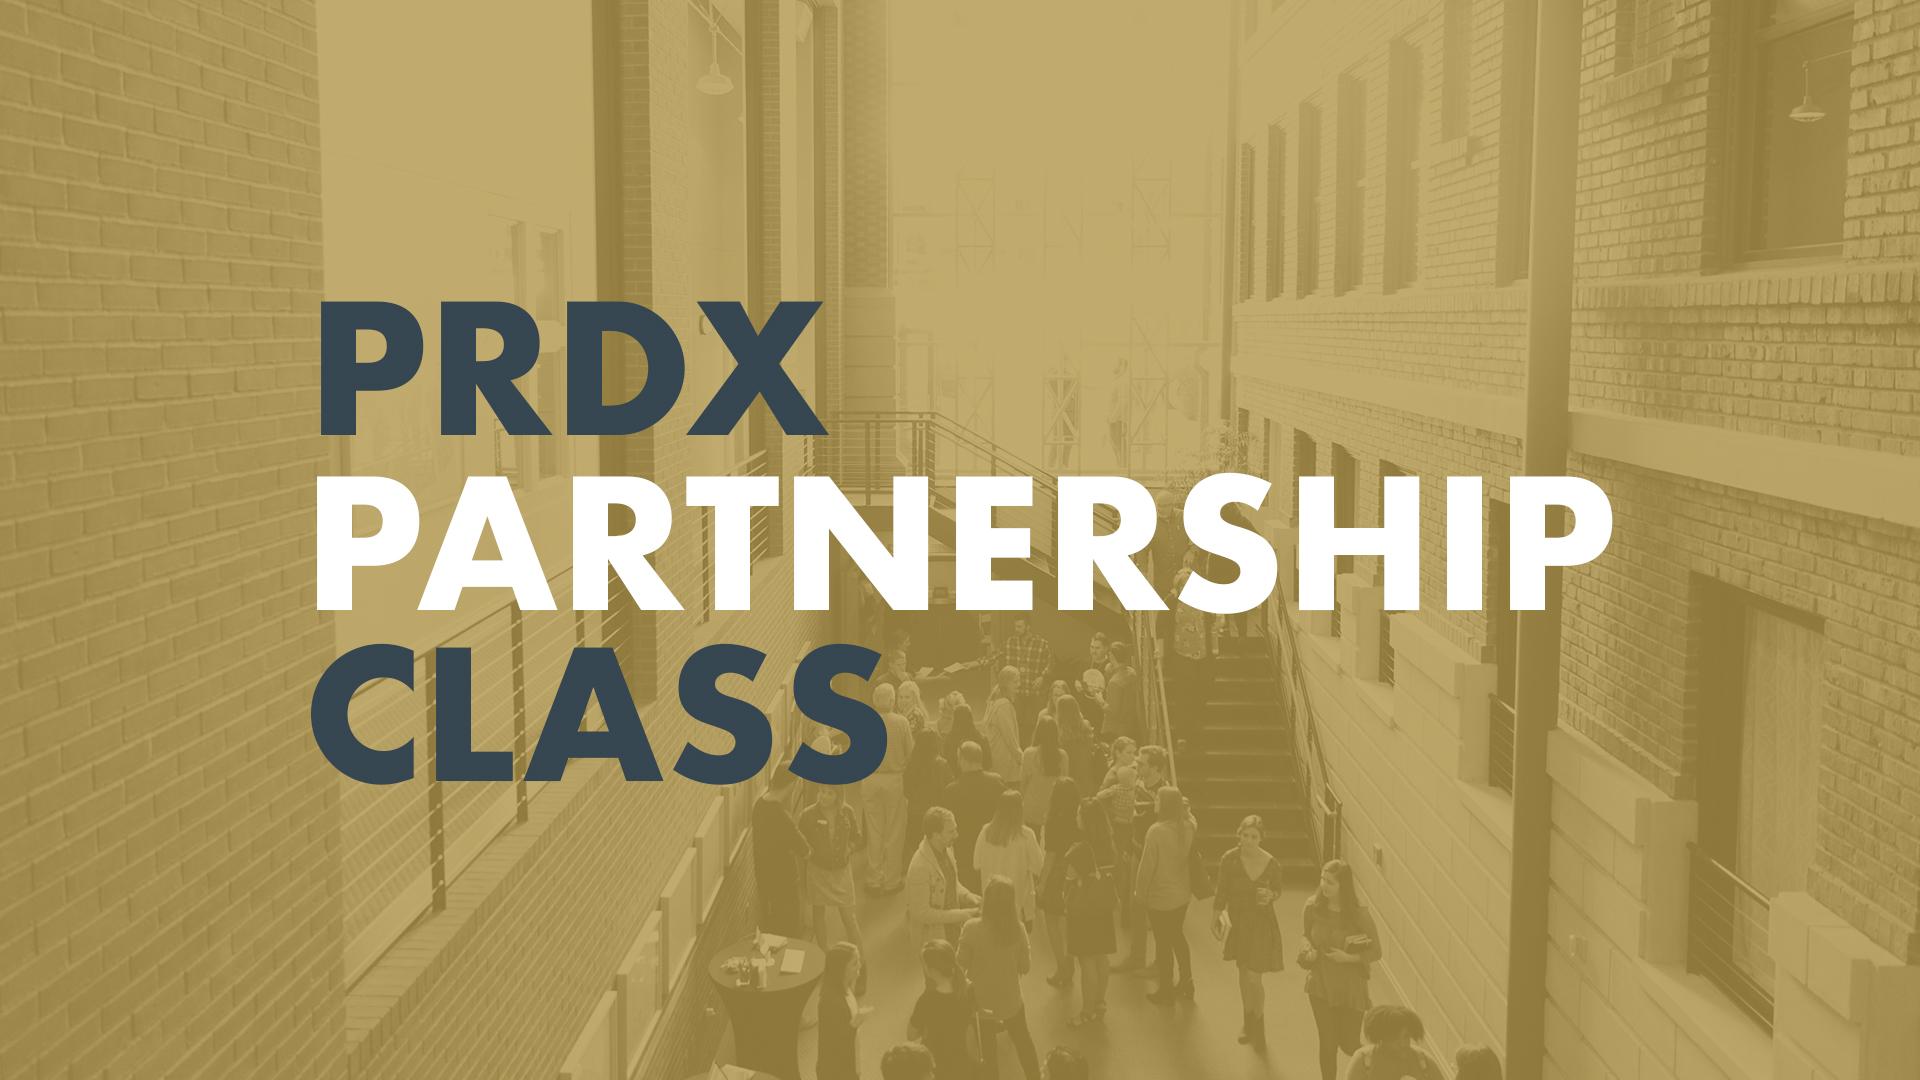 Prdx partnership class